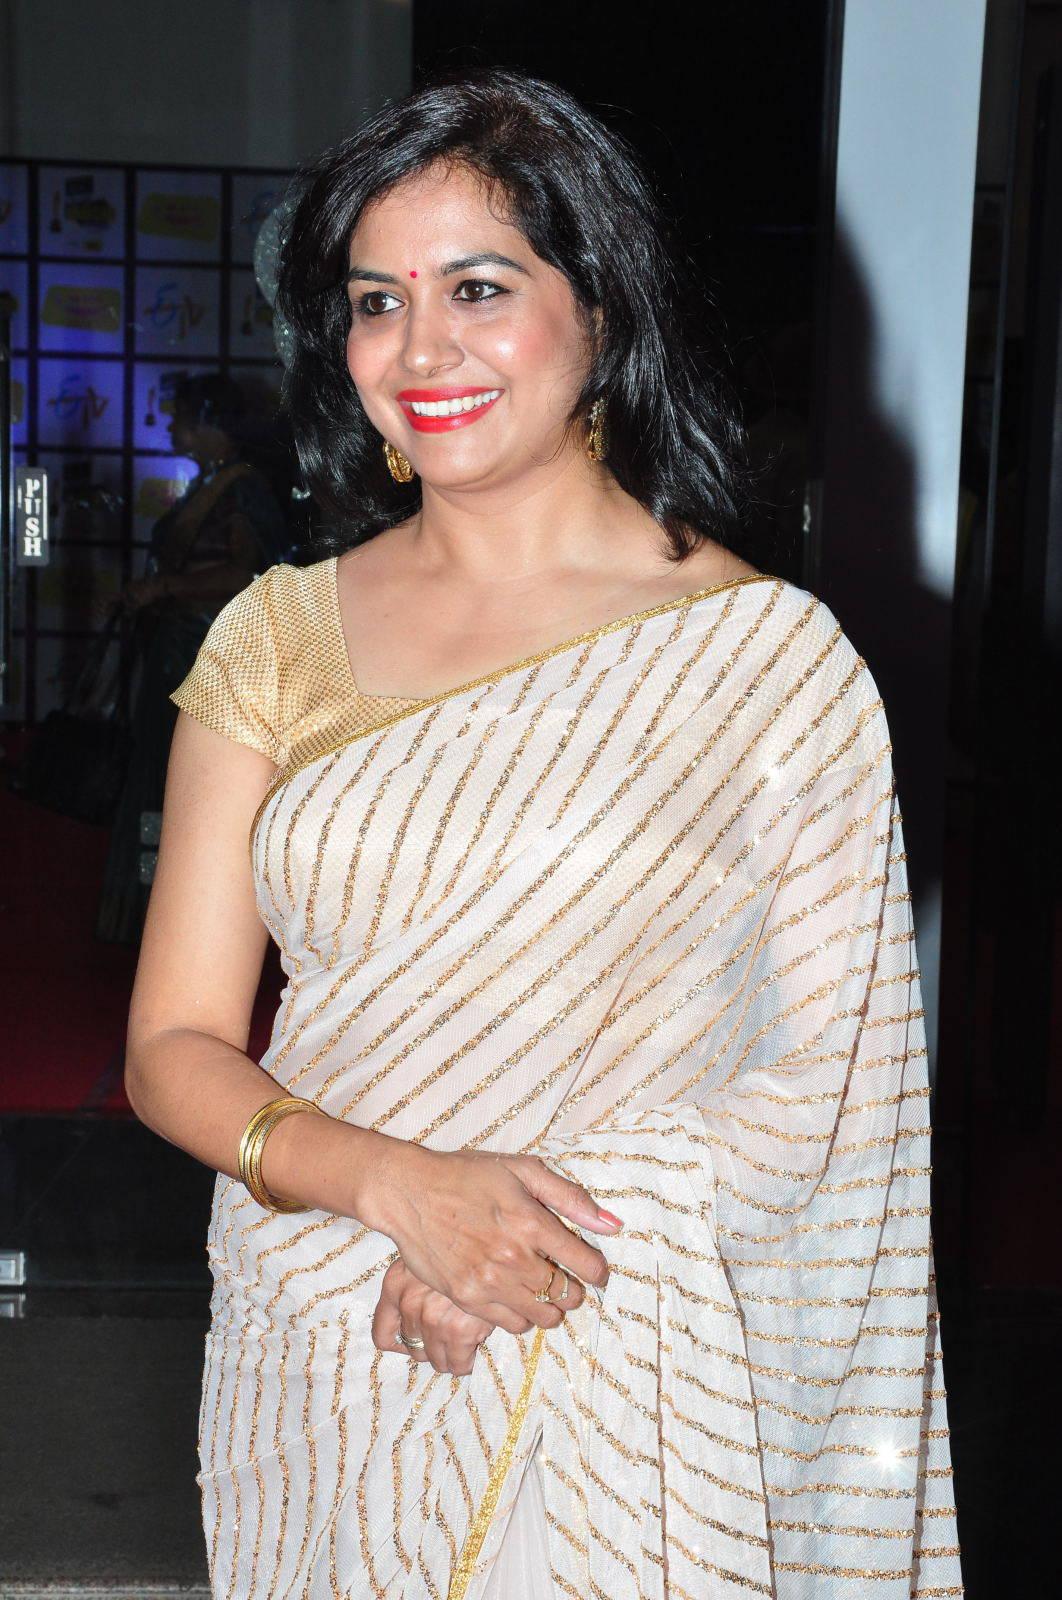 Singer Sunitha Photos In White Saree